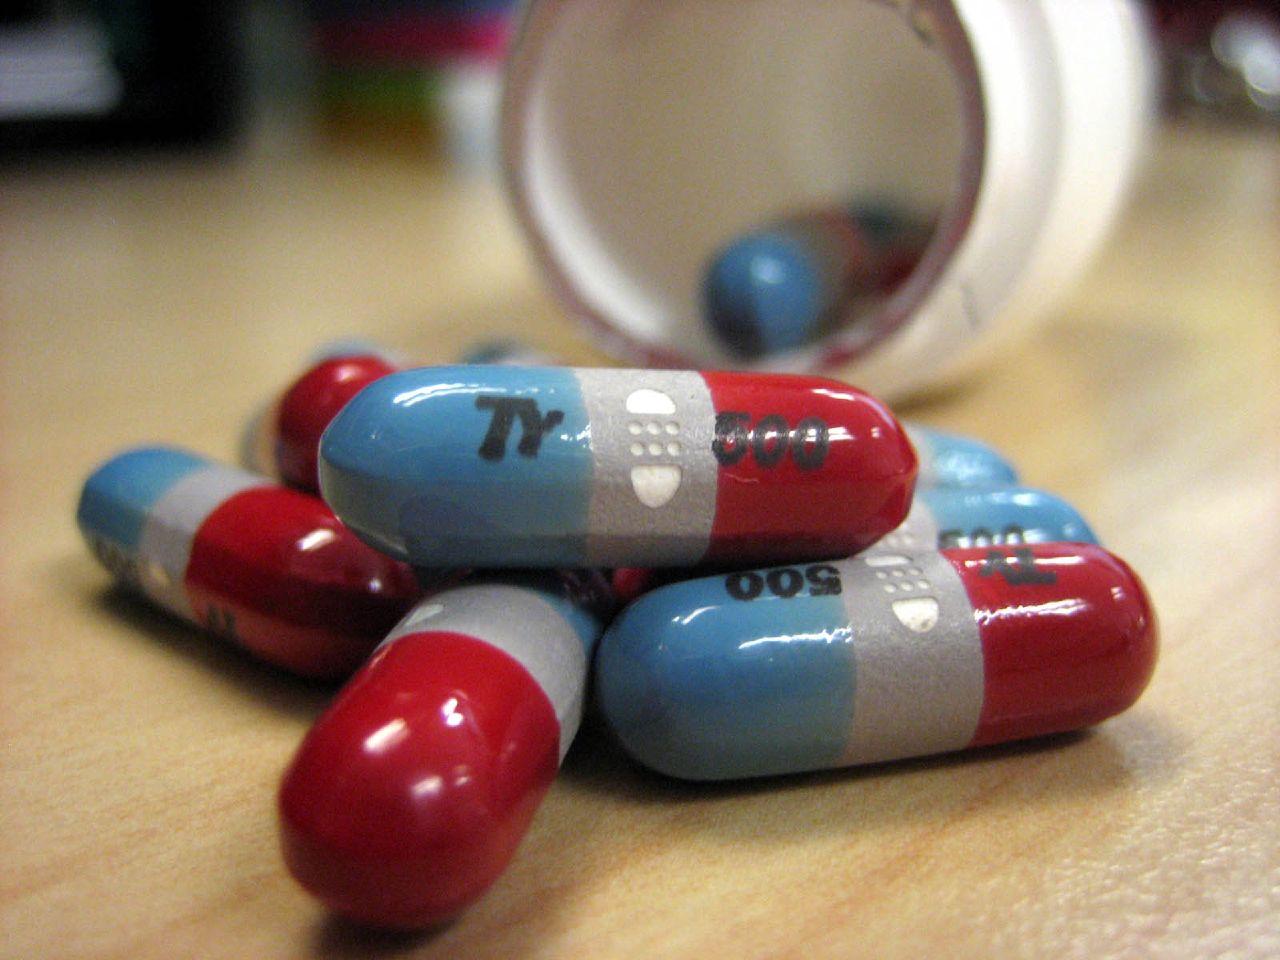 Does Tylenol help fibromyaglia?